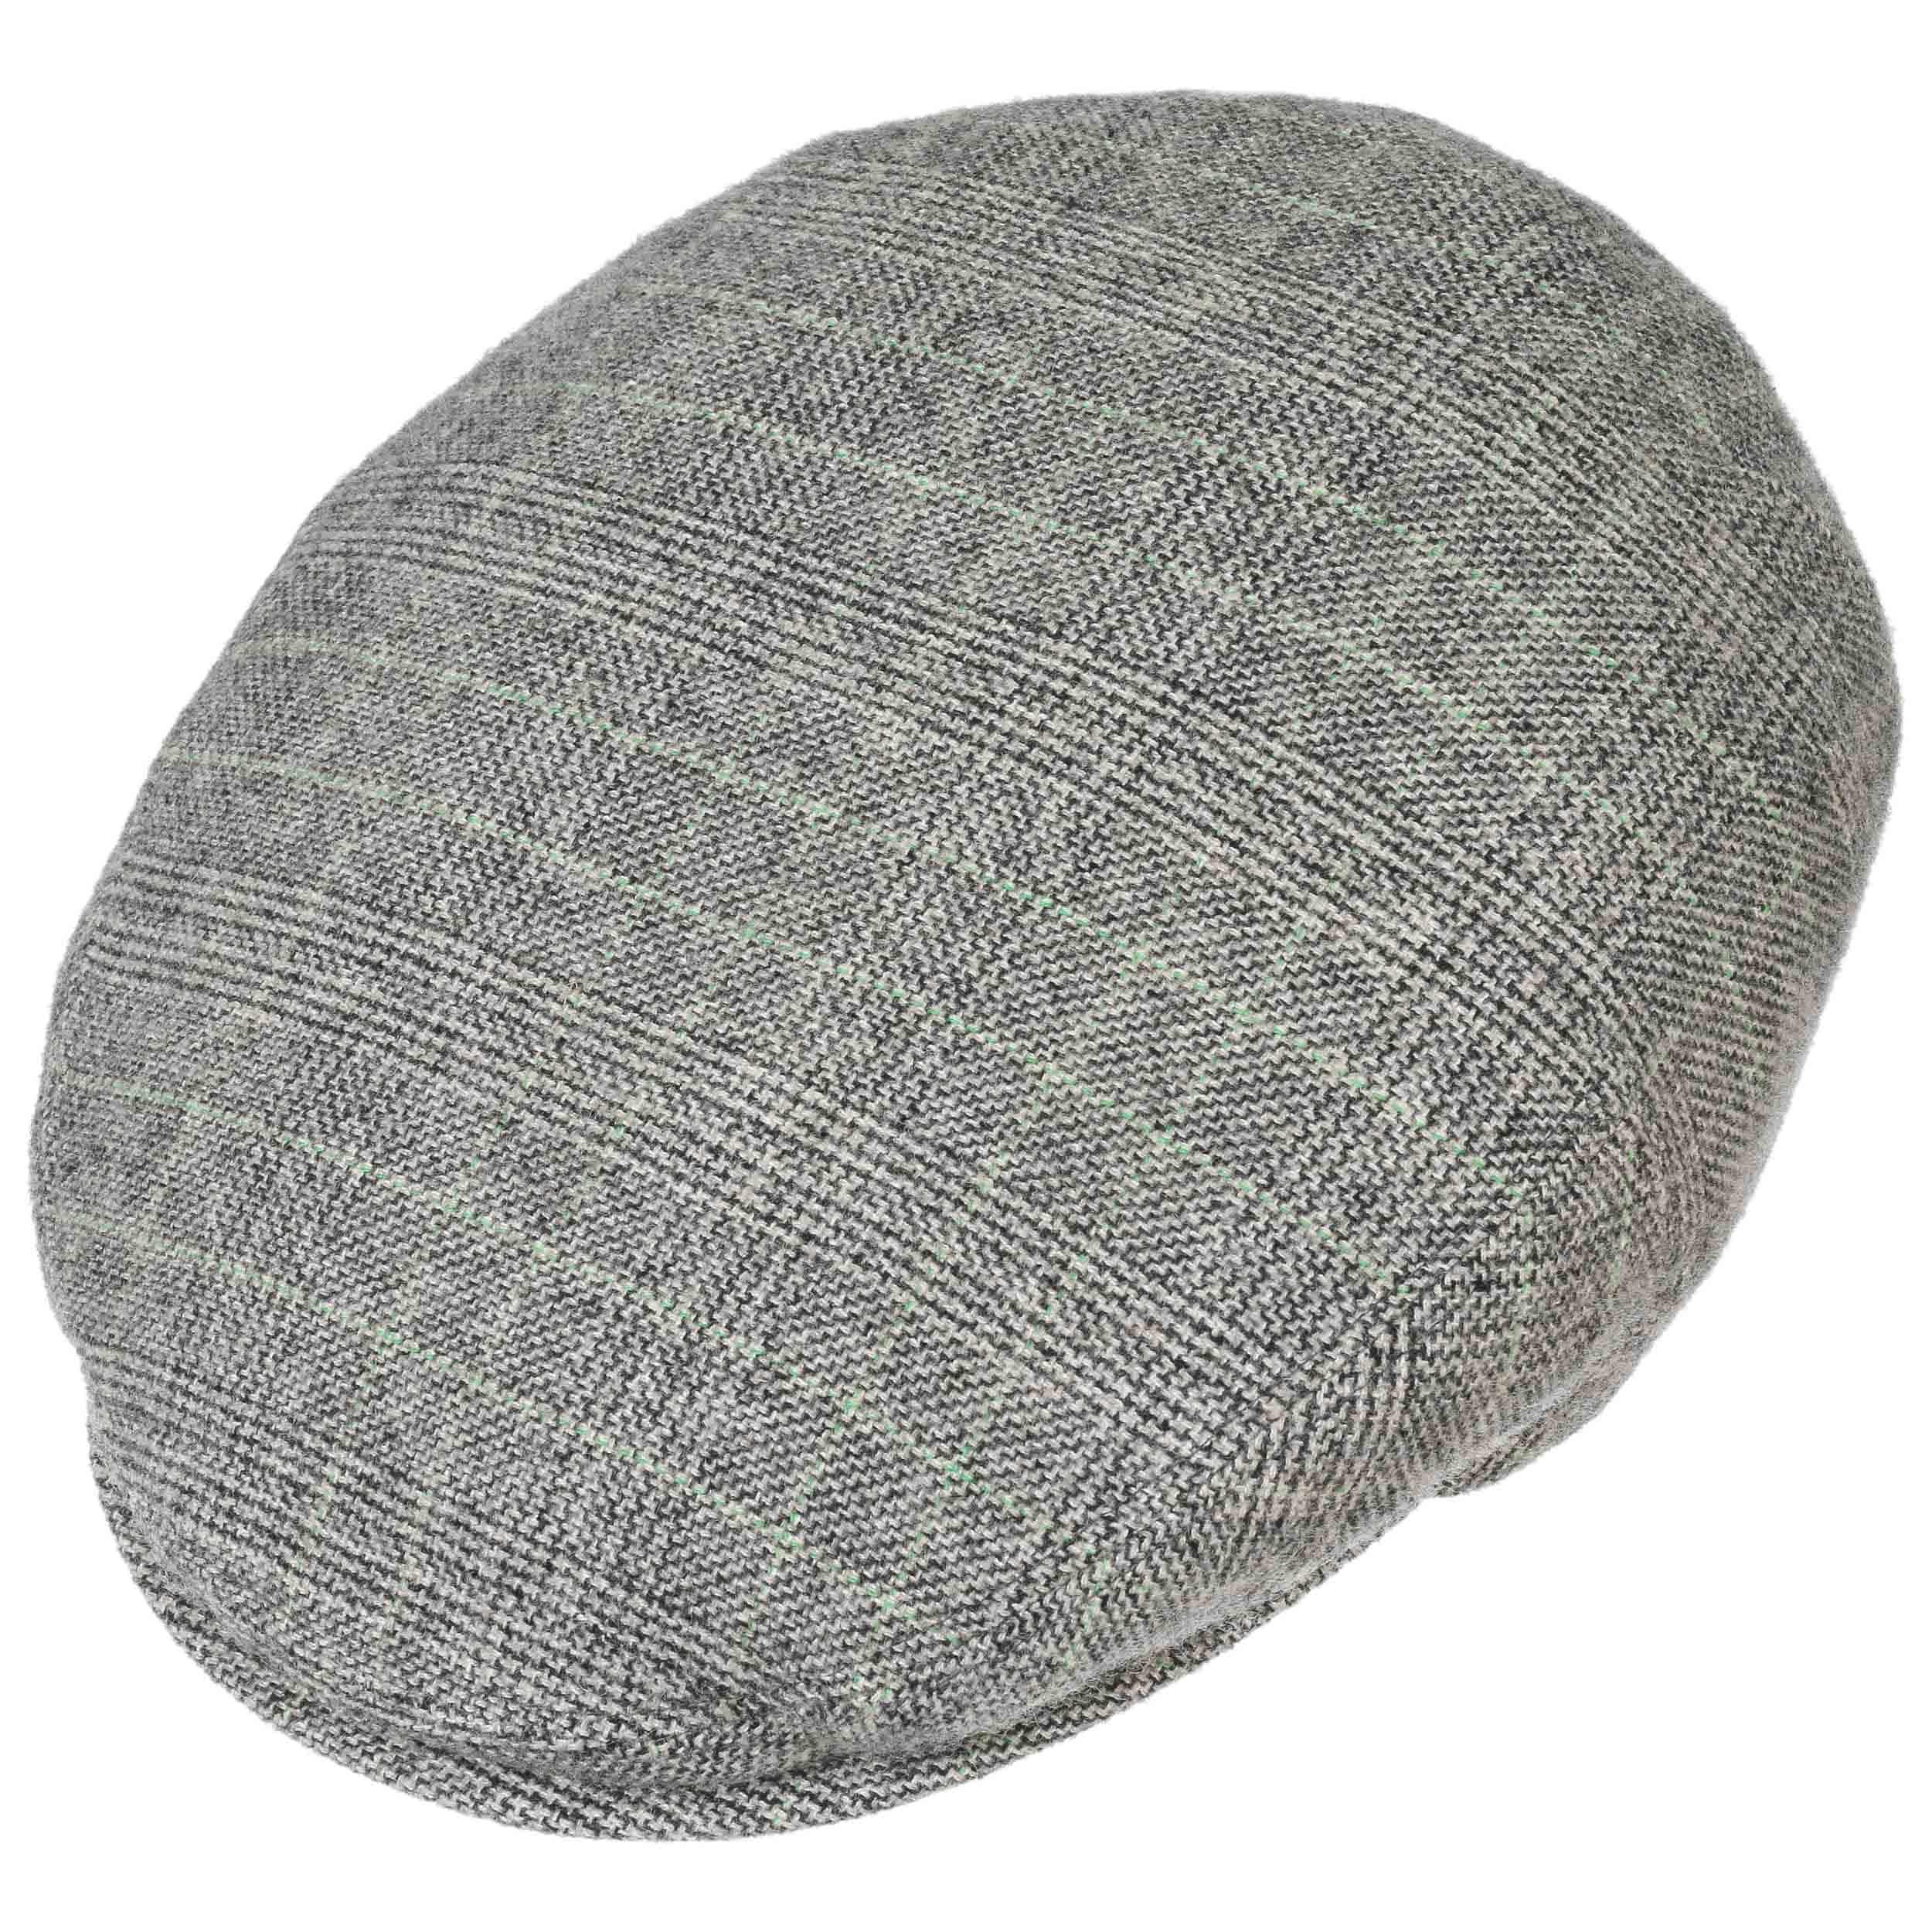 Bangor Cashmere Silk Flat Cap by Stetson - grey 1 ... ce22922d2f24